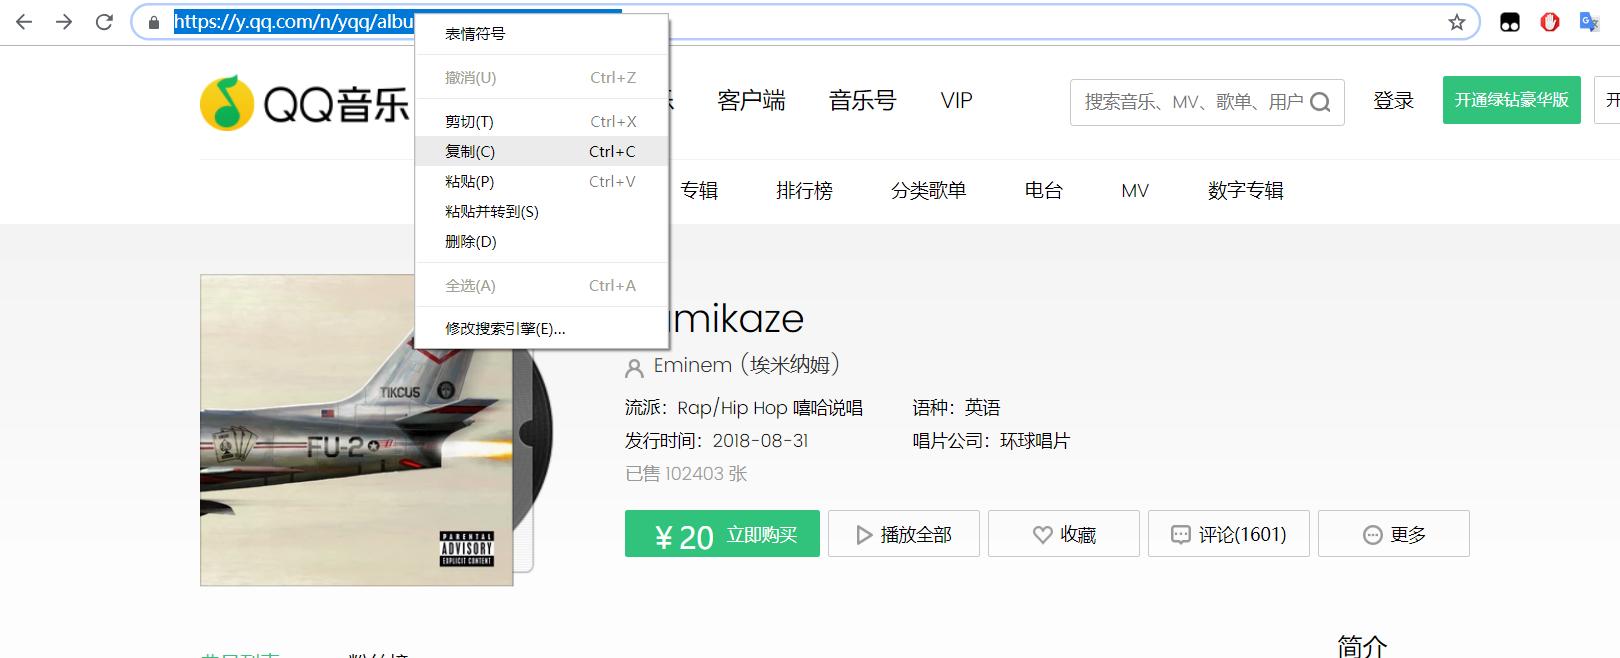 QQ音乐下载器,可下载版权音乐和FLAC无损音频https://www.hiquer.com